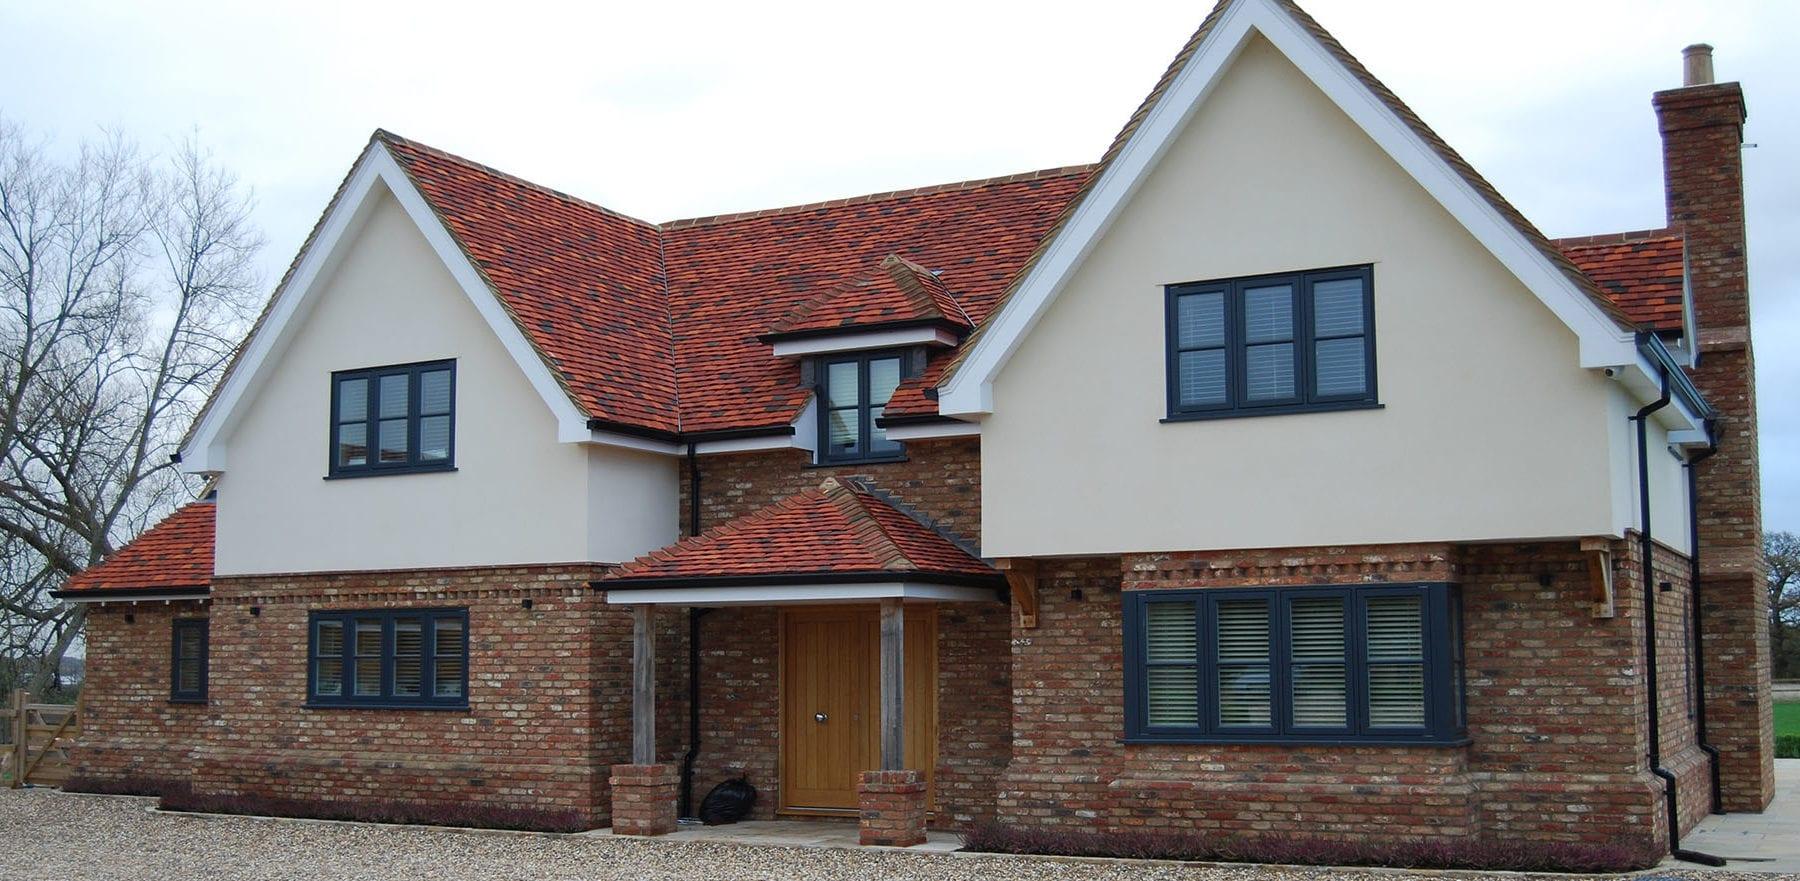 Lifestiles - Handmade Multi Clay Roof Tiles - Nazing, England 3